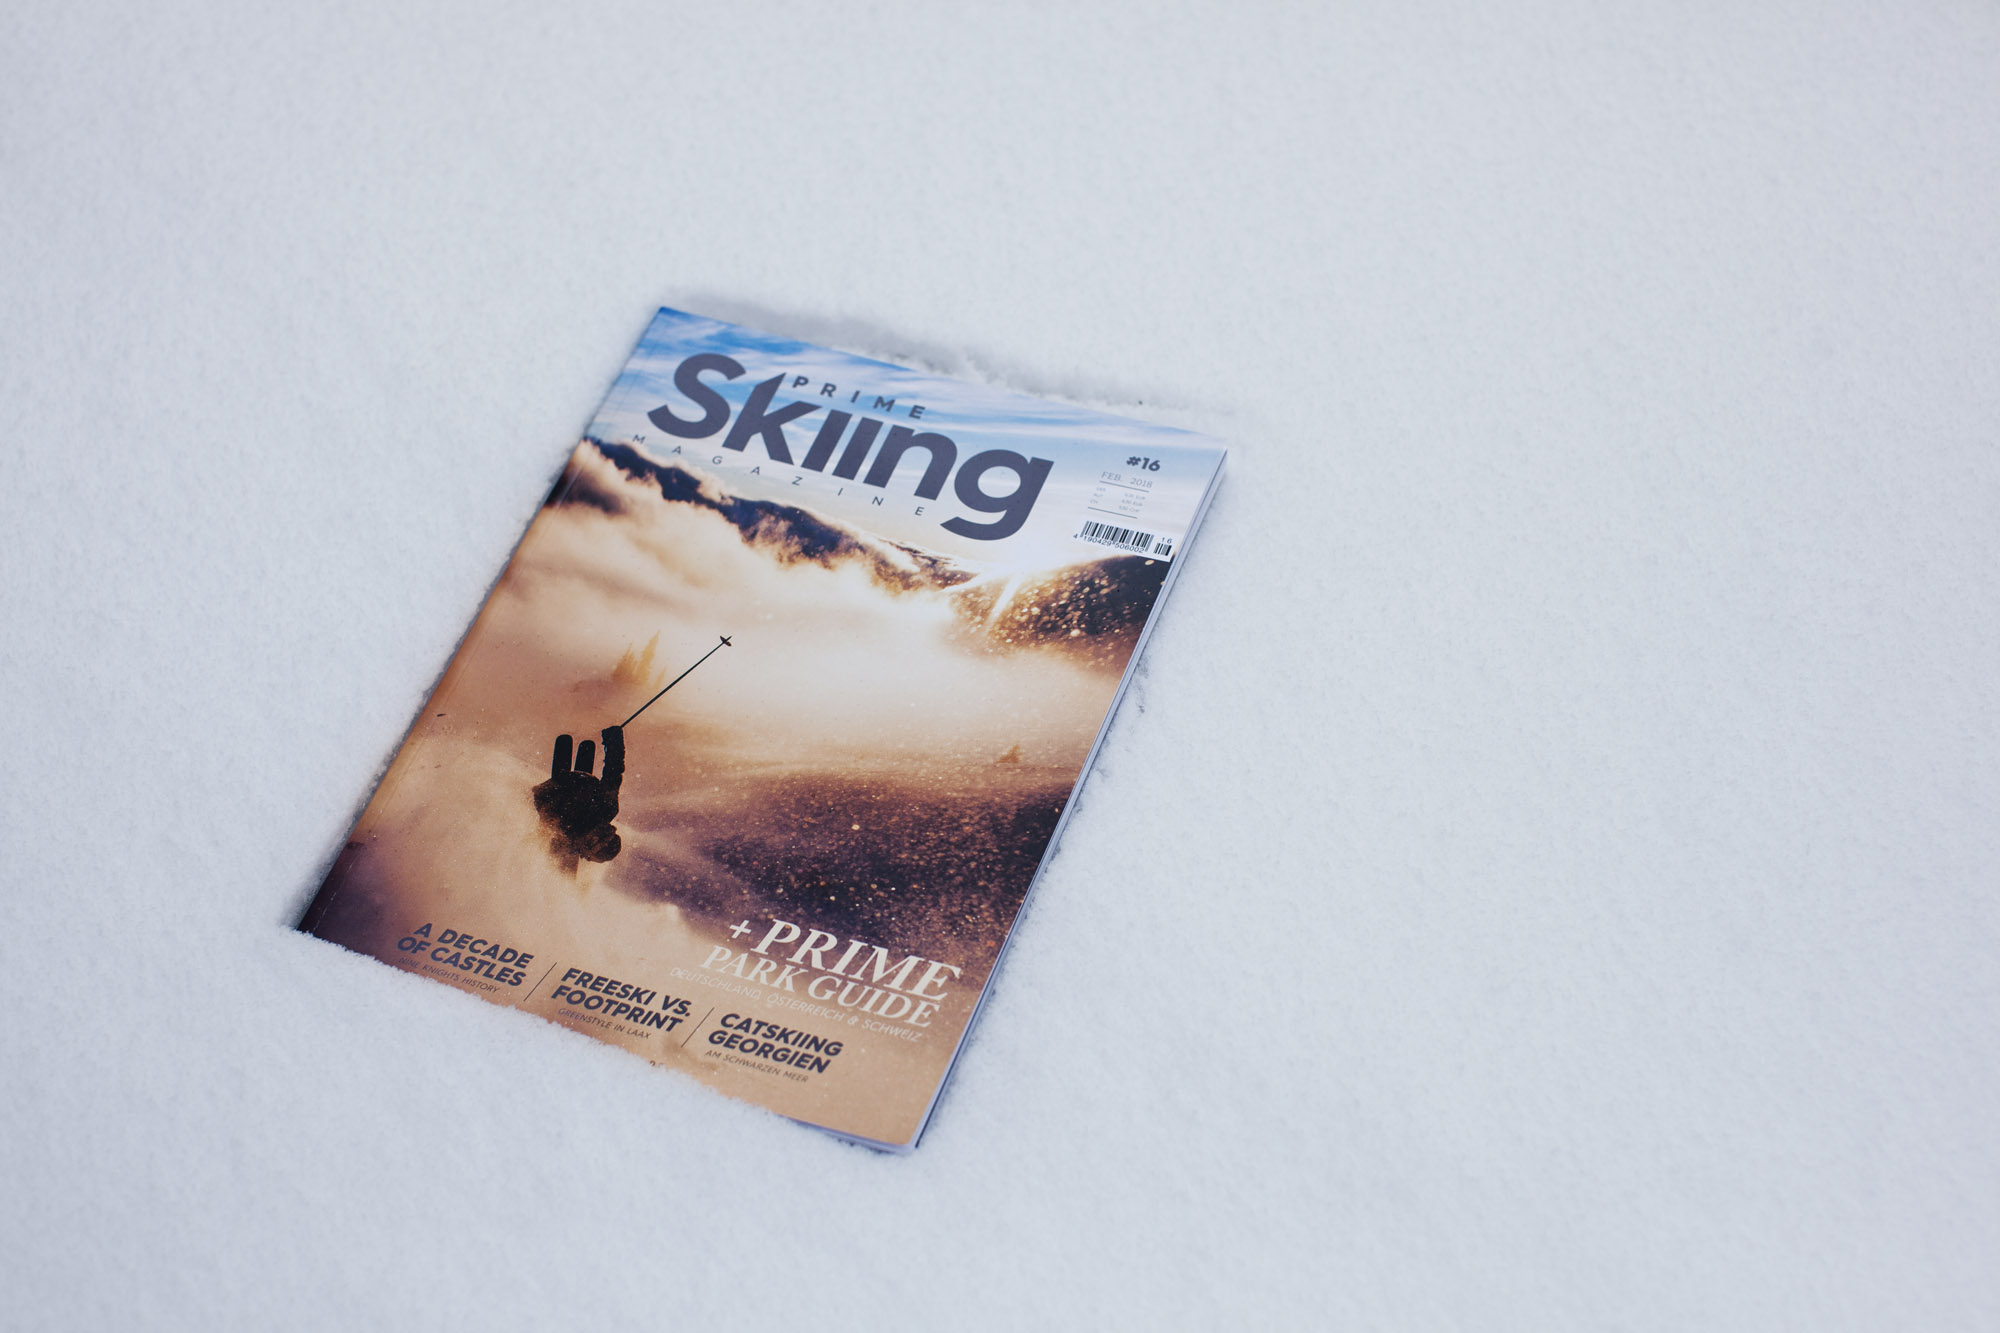 Prime Skiing #16